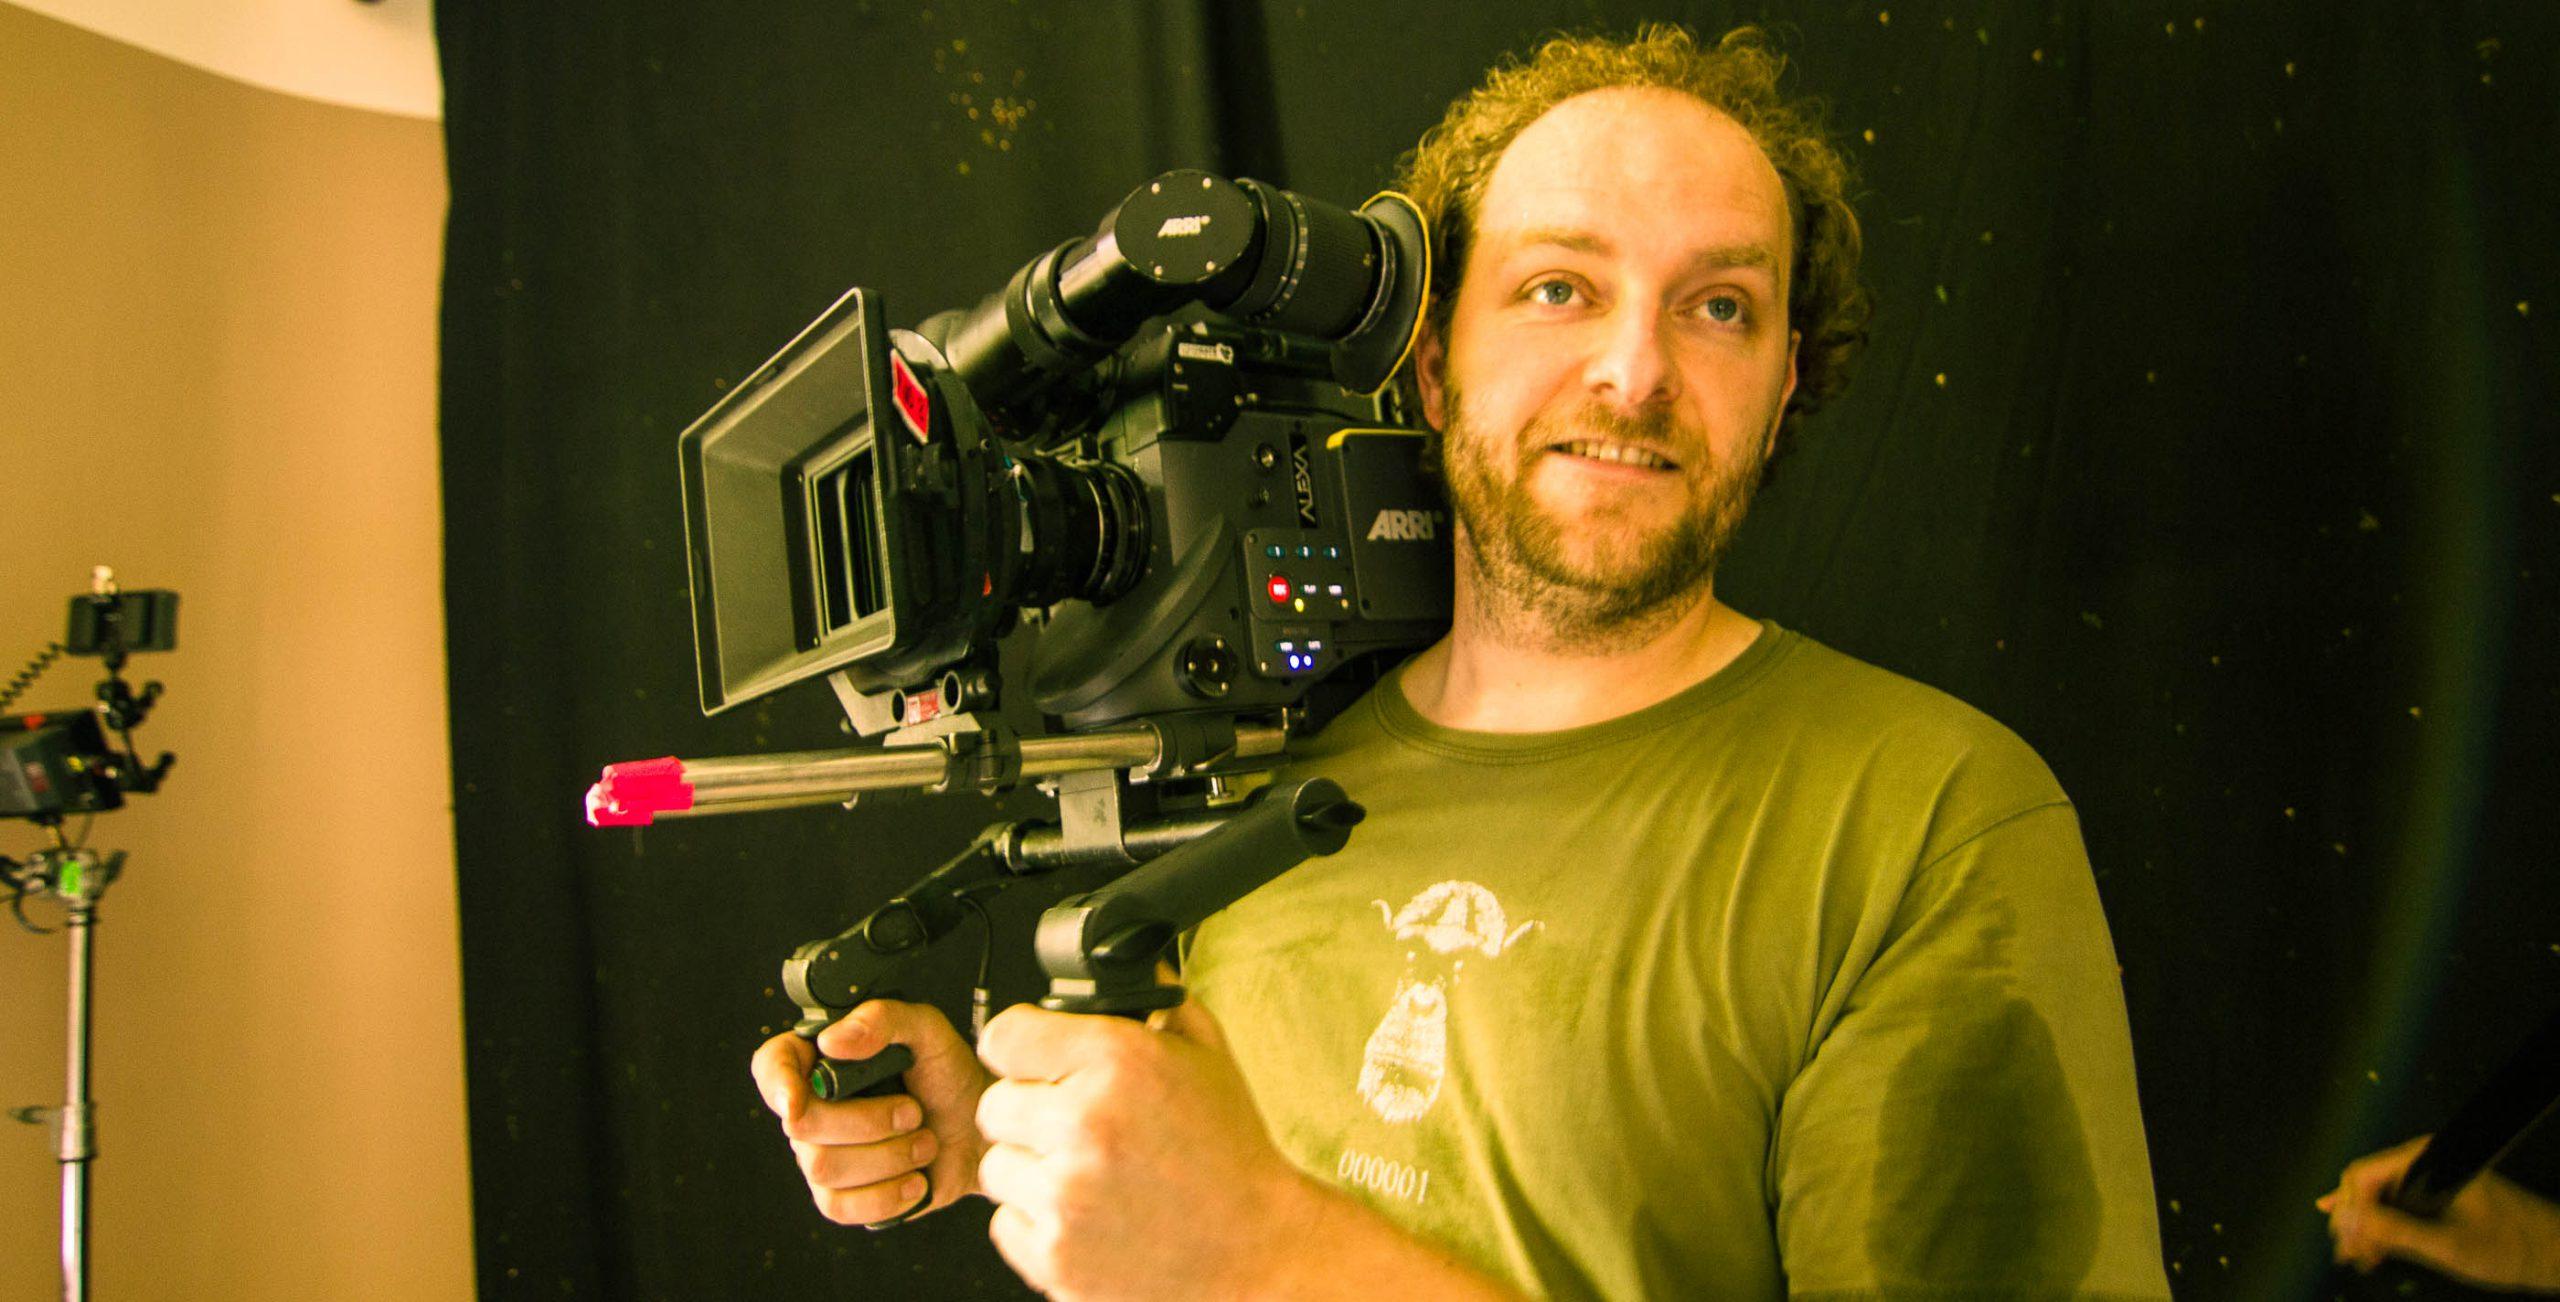 Joe Berger Cinematographer at Work